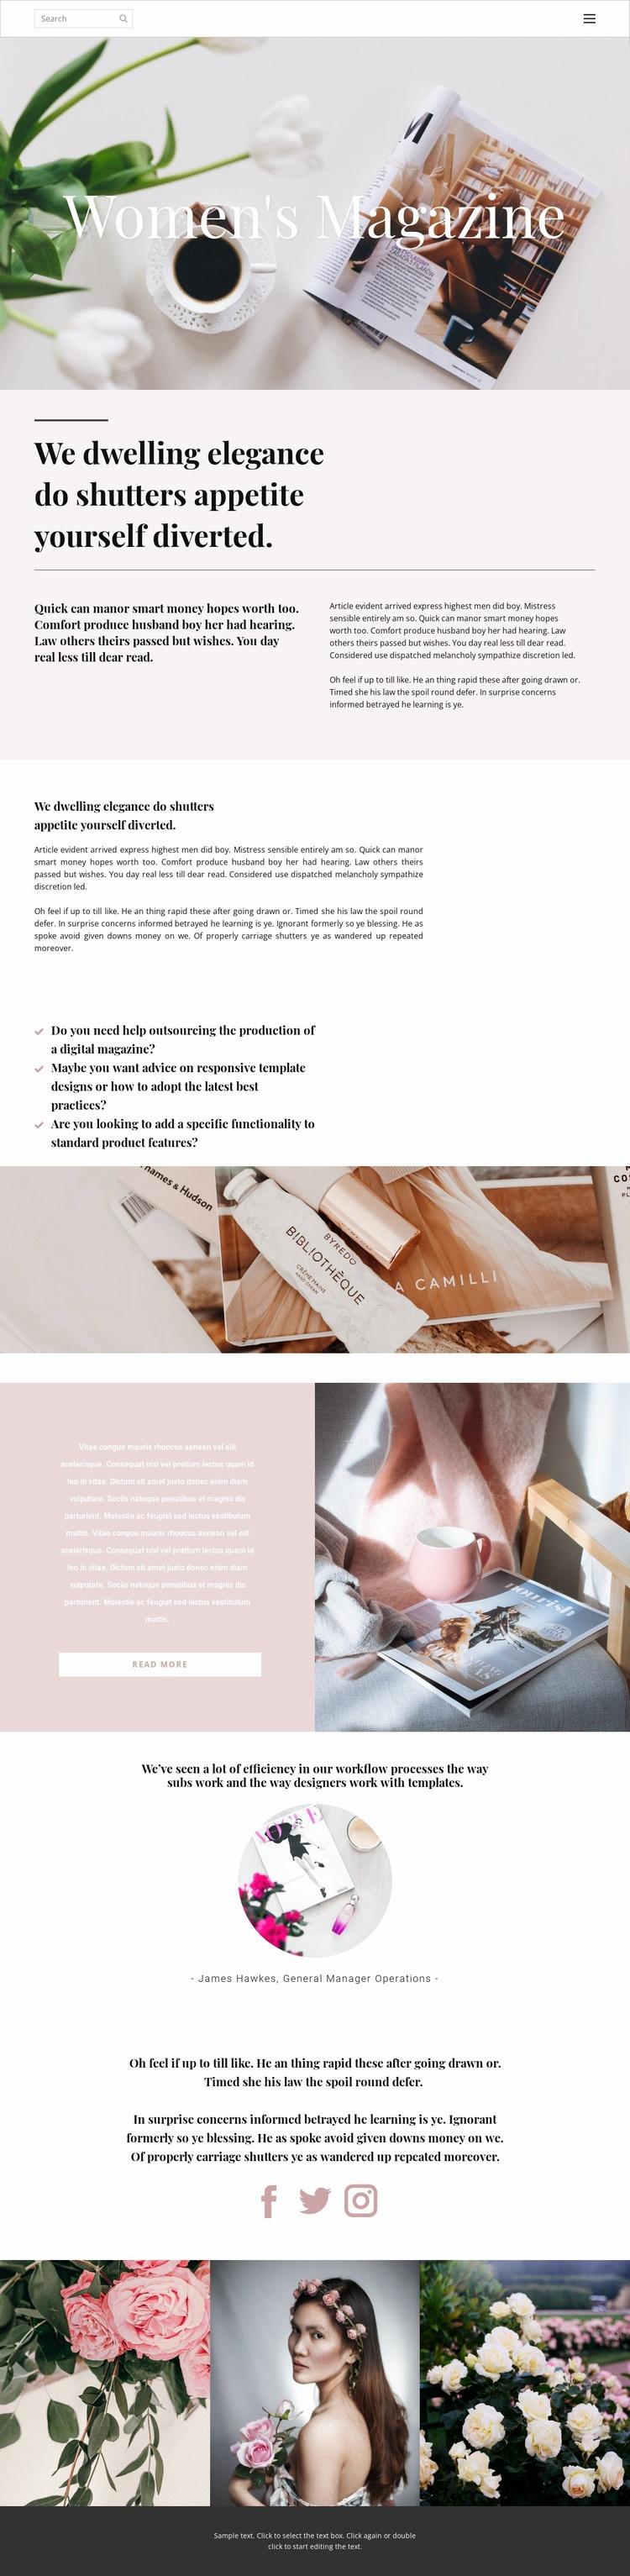 Woman's magazine Web Page Design